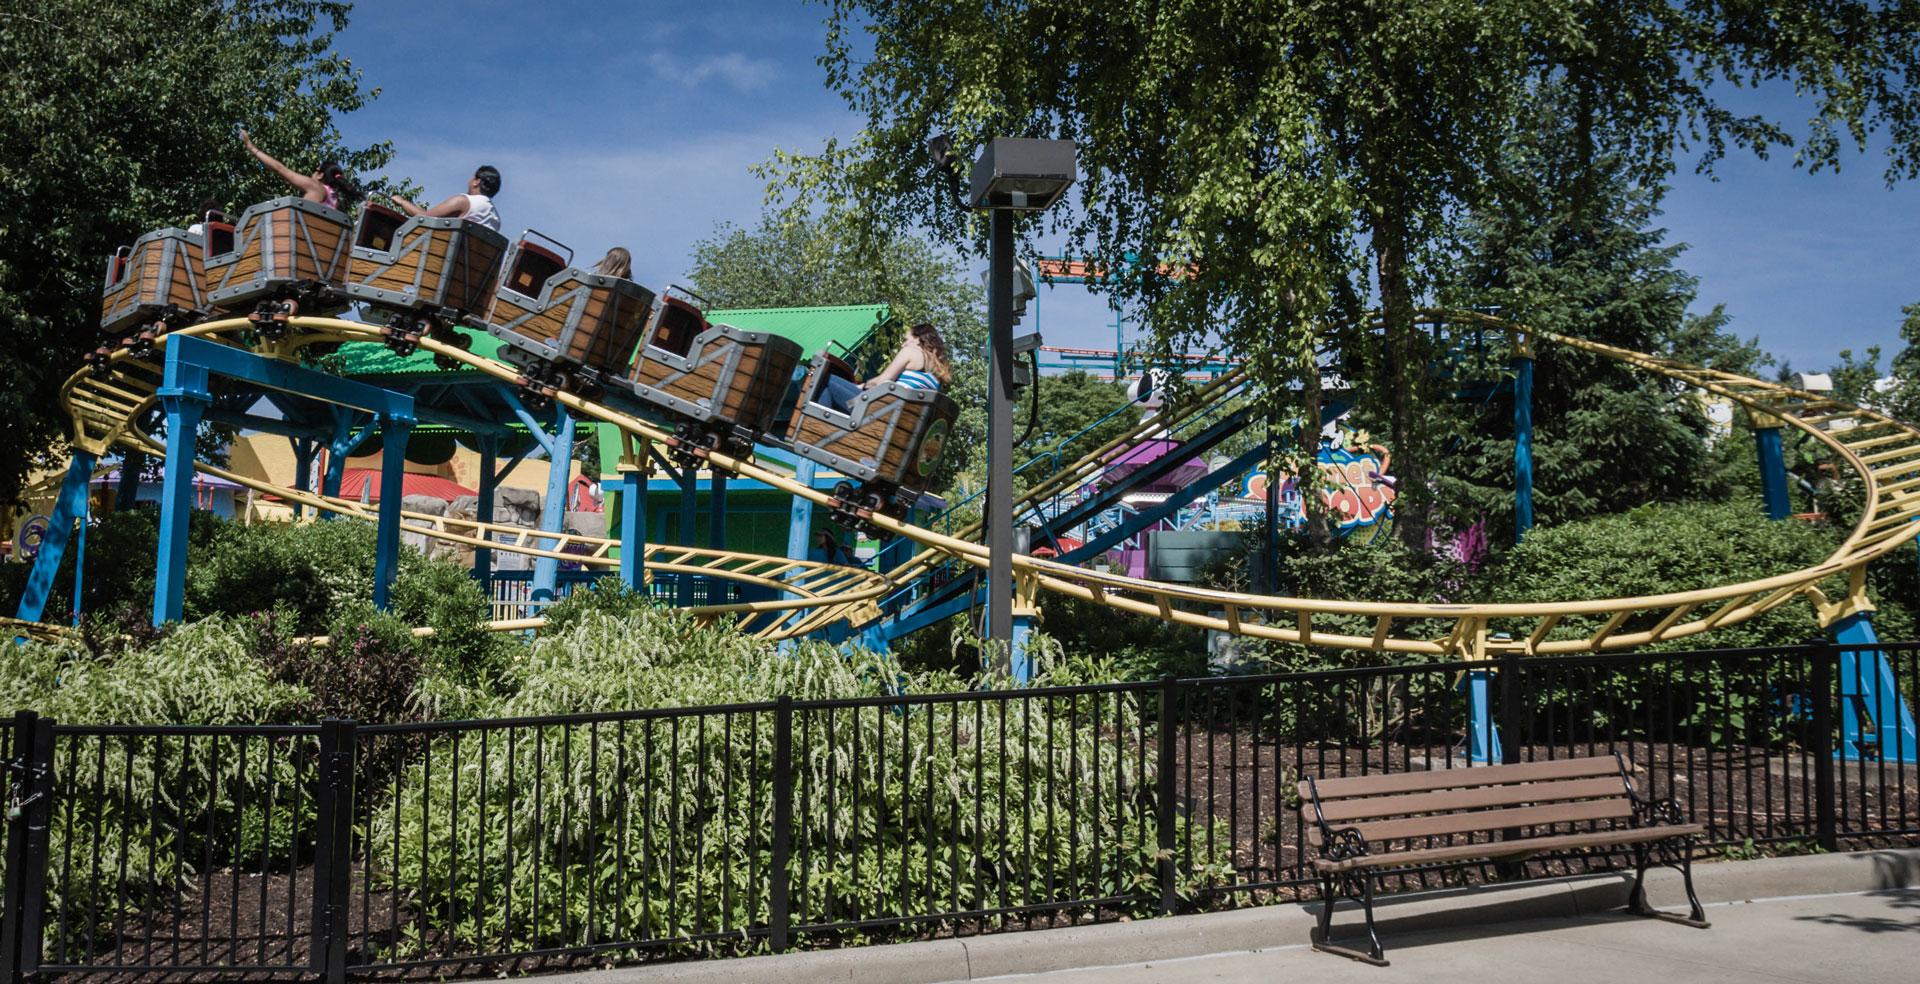 y express parma town park - photo#1